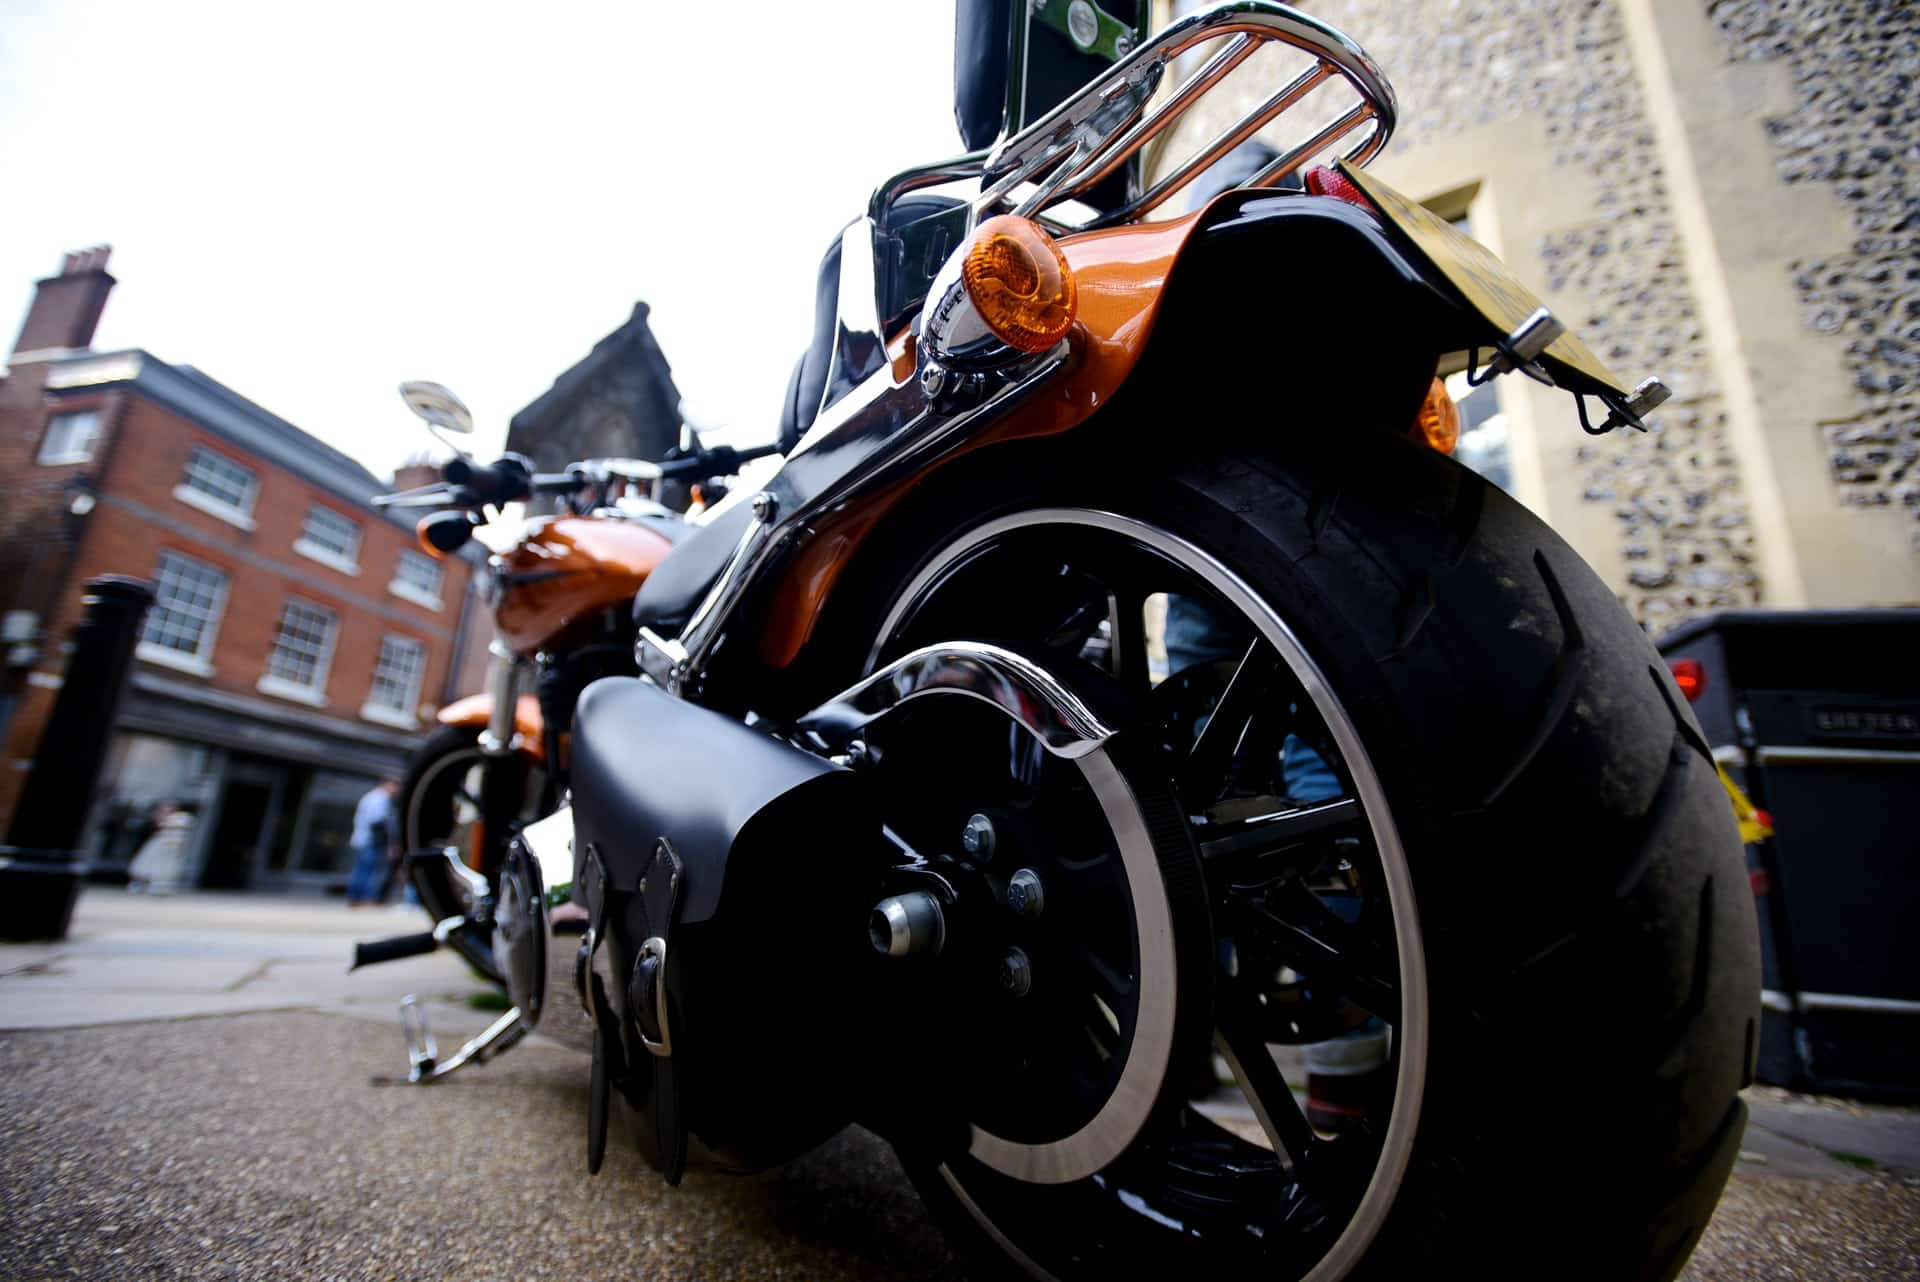 motorcycle wheel low angle